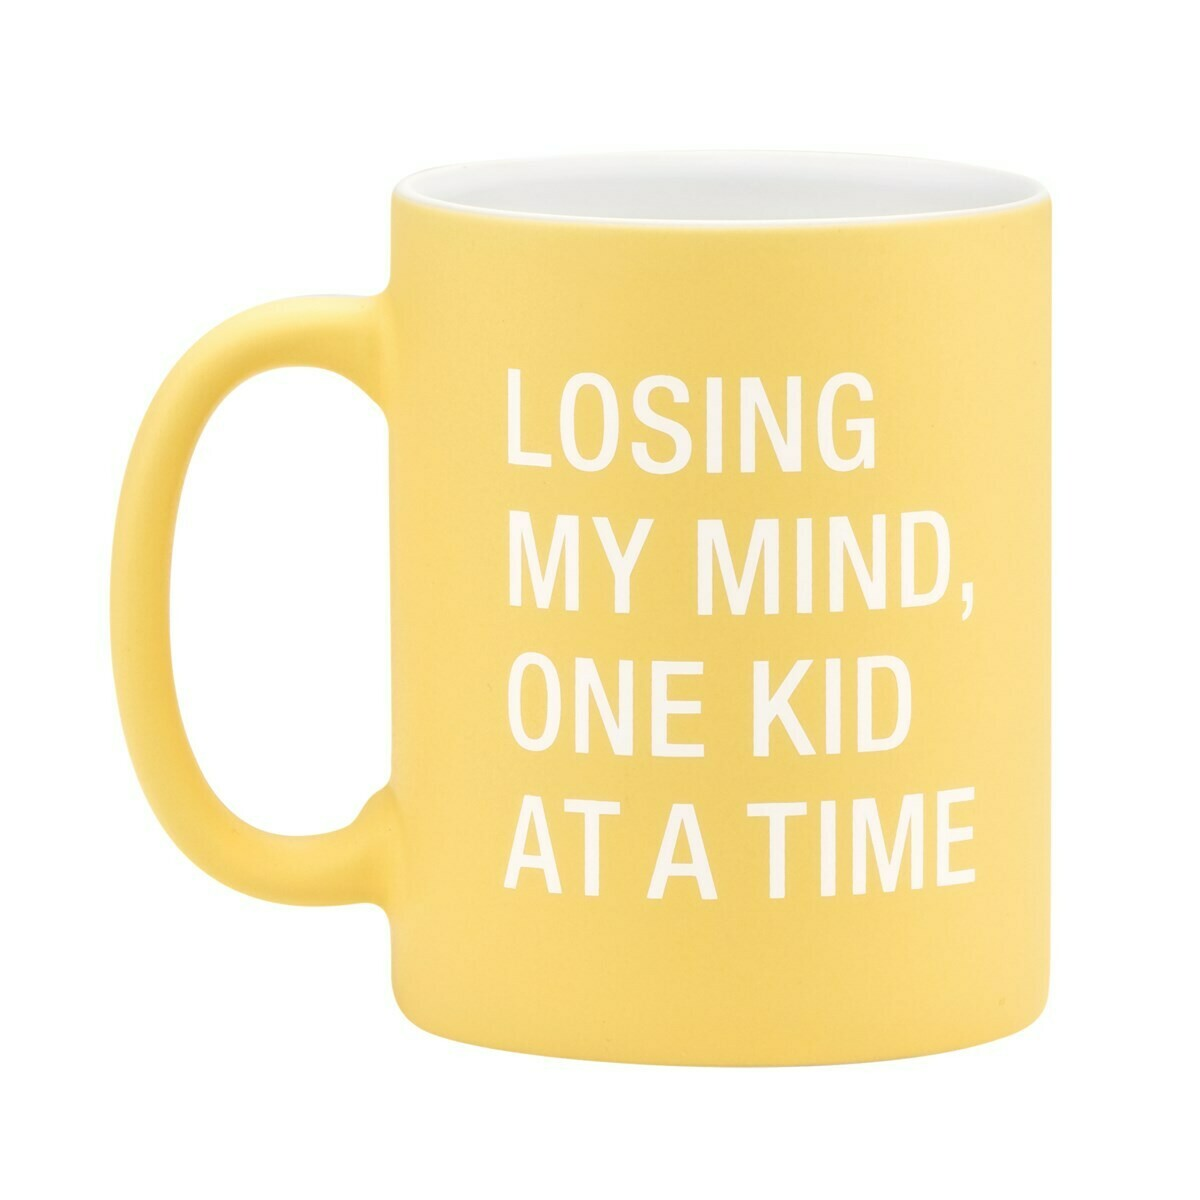 Mug - Losing My Mind One Kid at a Time